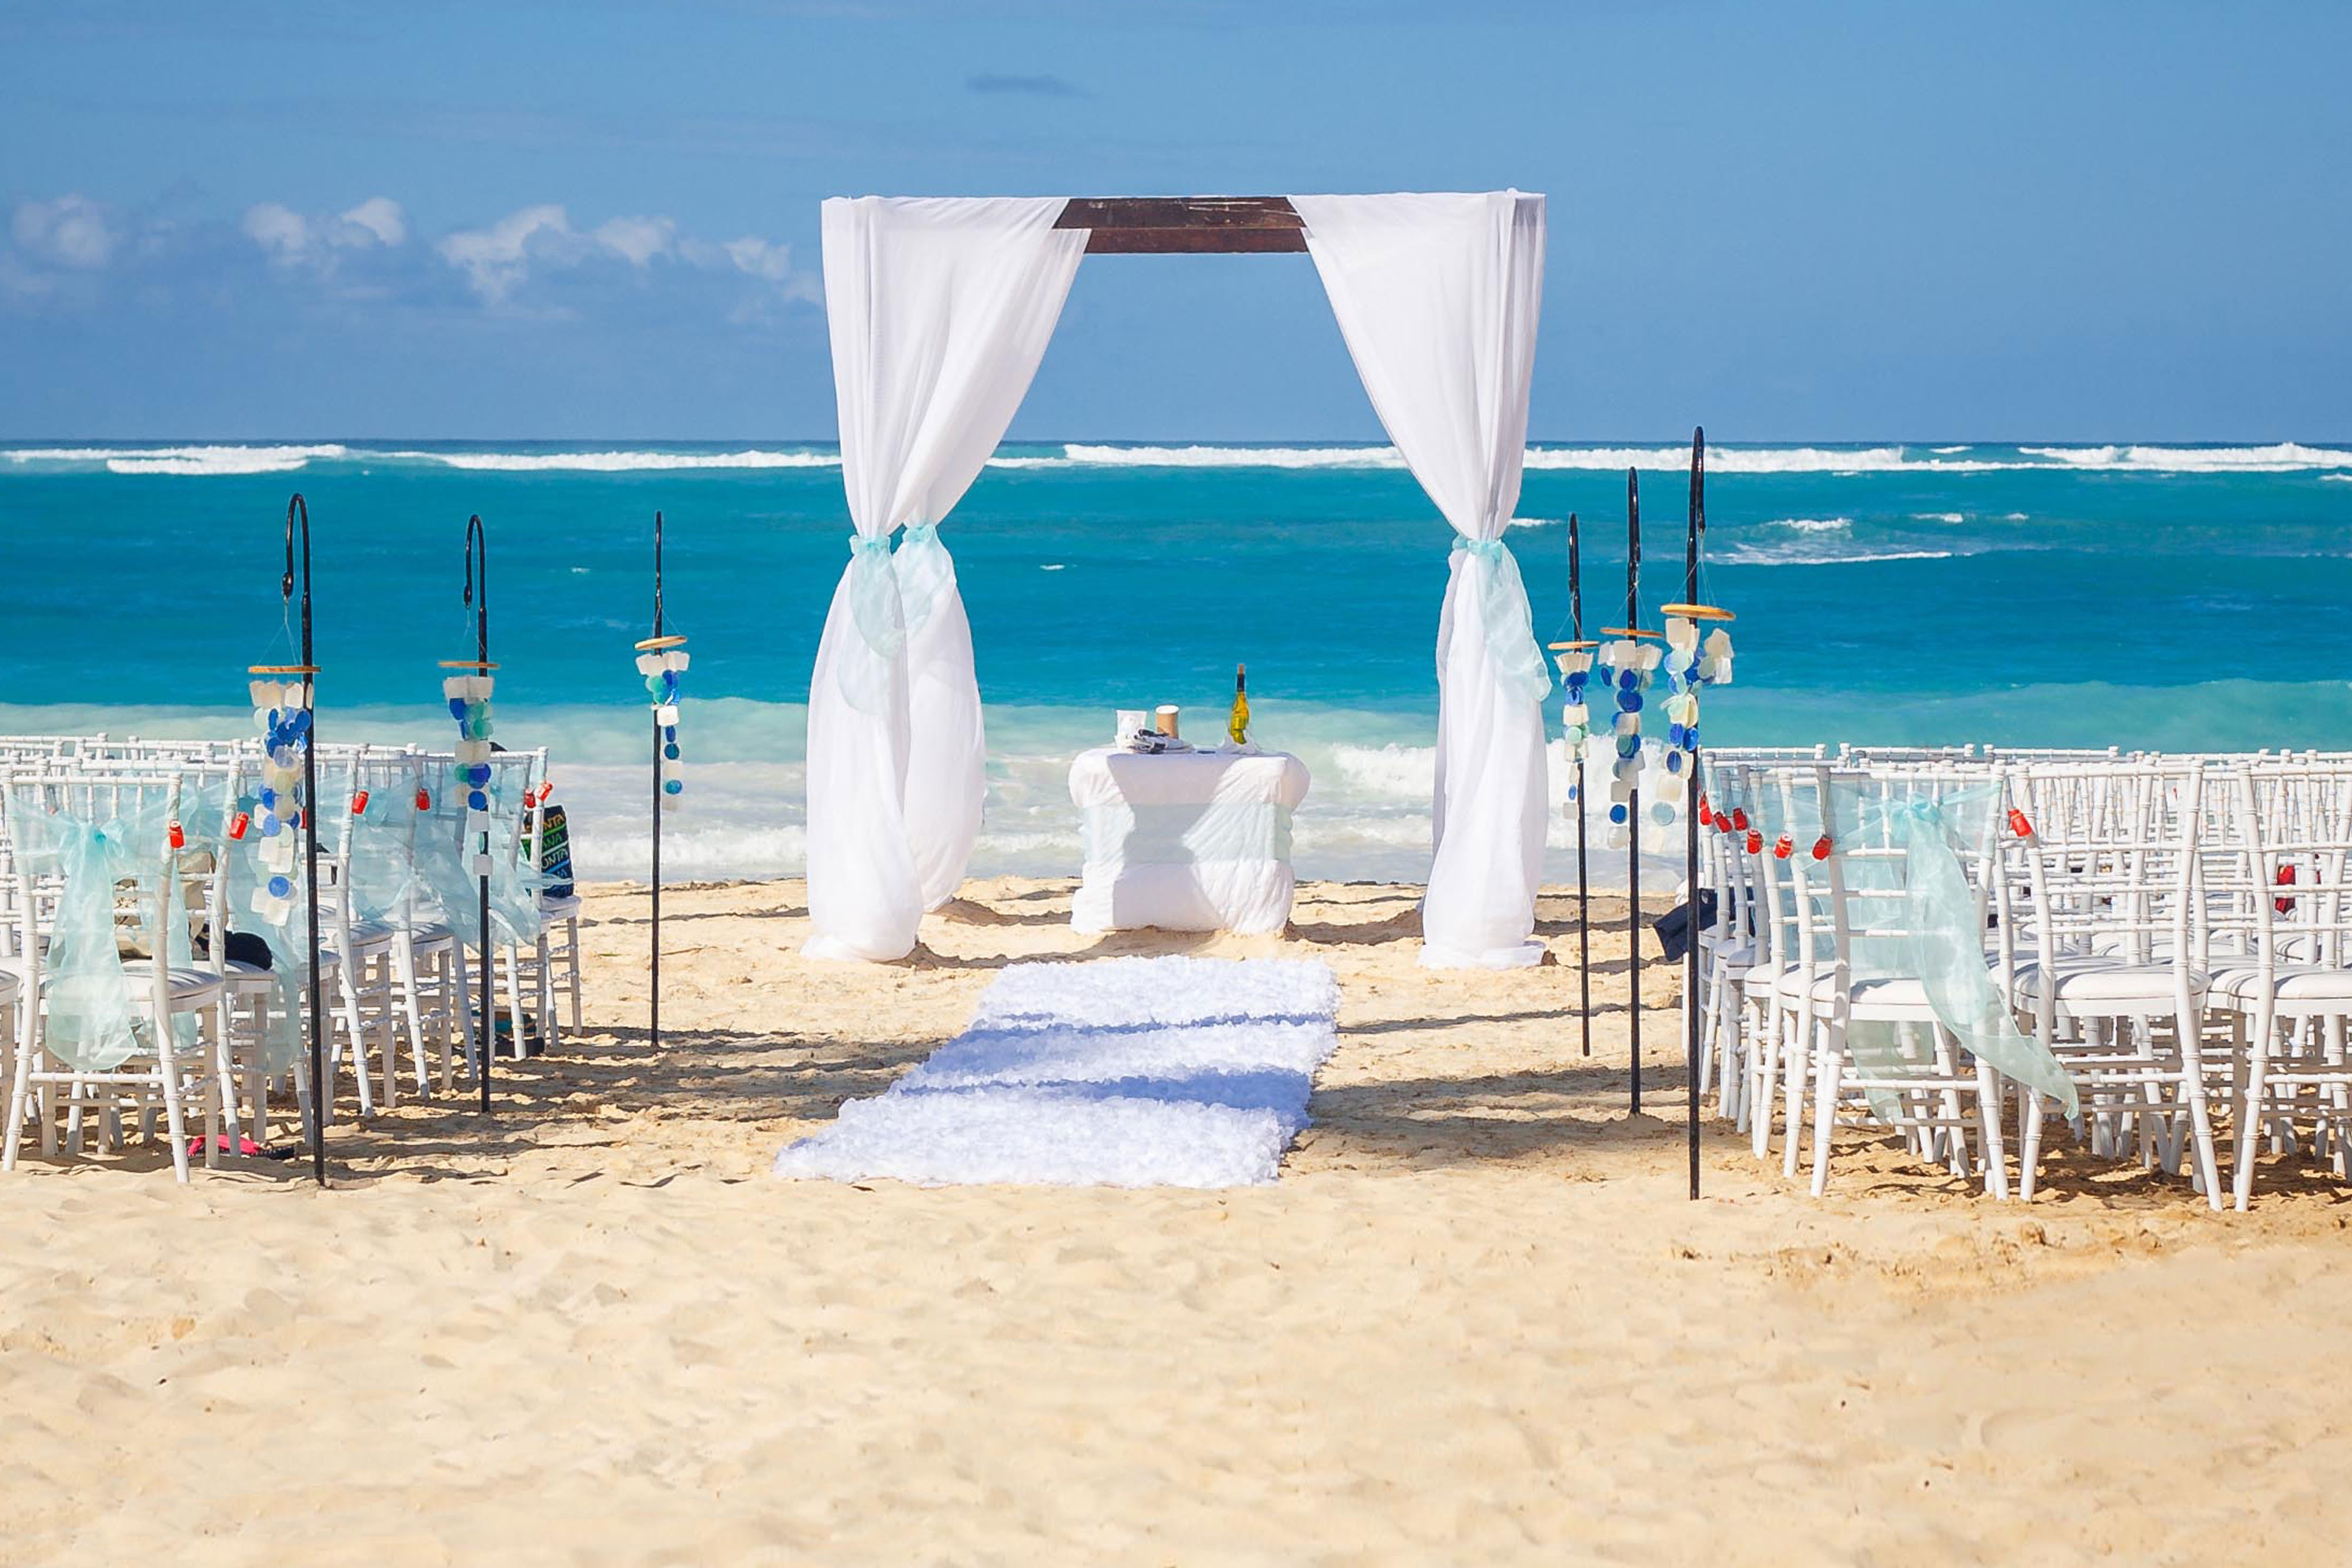 Myrtle Beach South Carolina Wedding Packages | Westgate Wedding Venue In Myrtle Beach